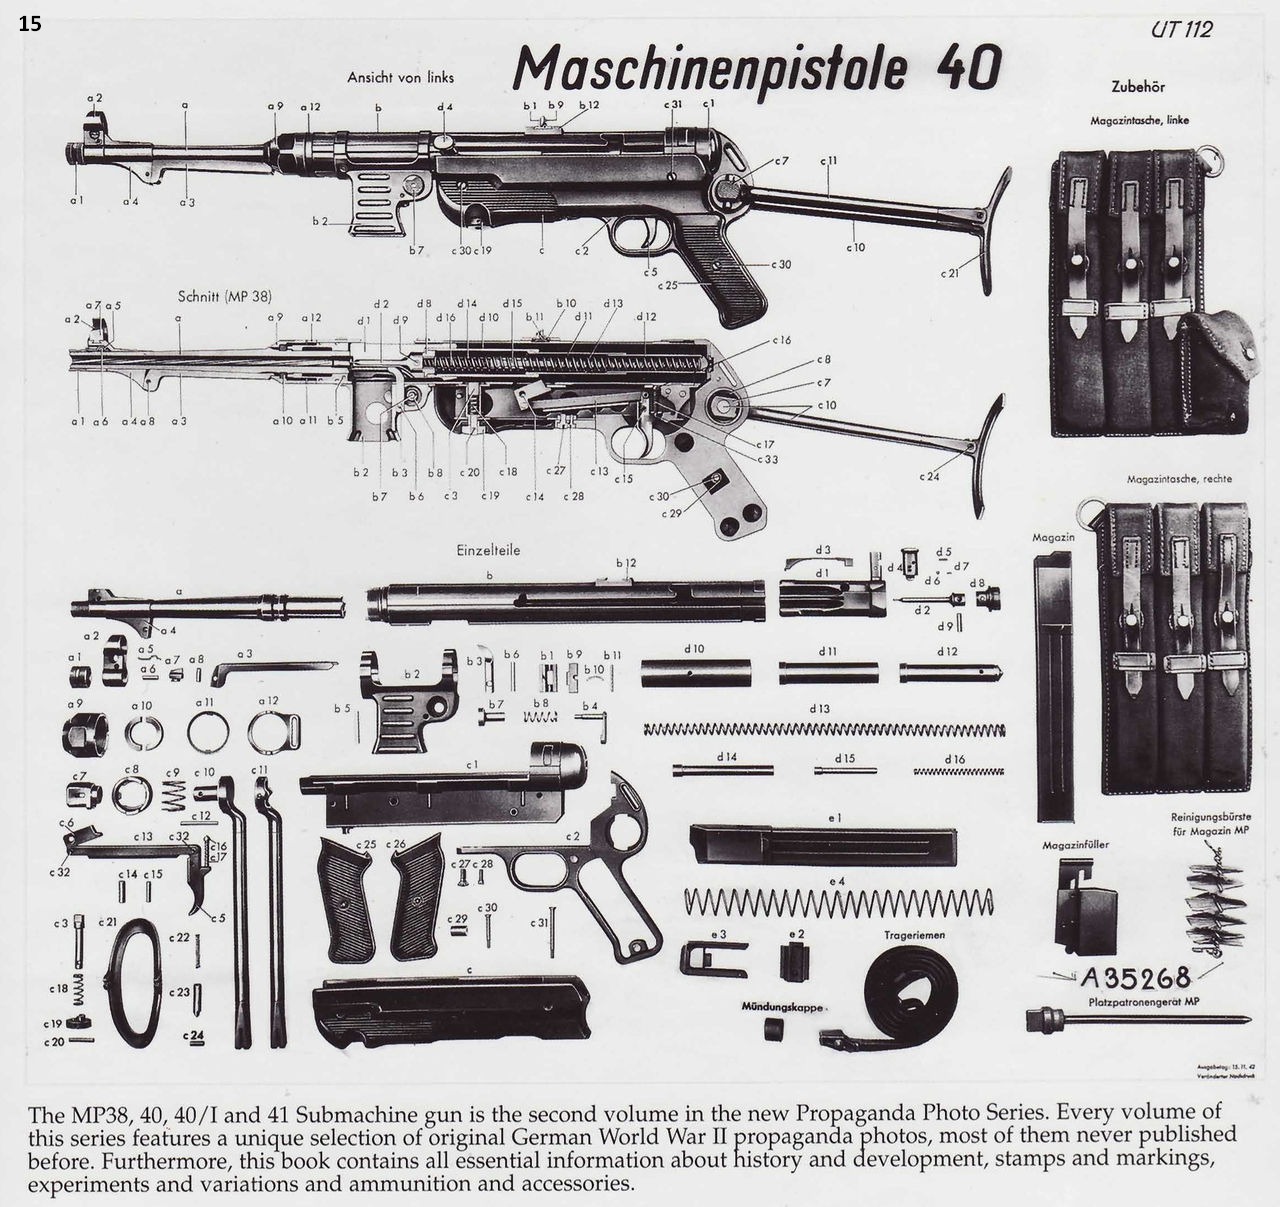 Mp 40 Erfurter Maschinenfabrik